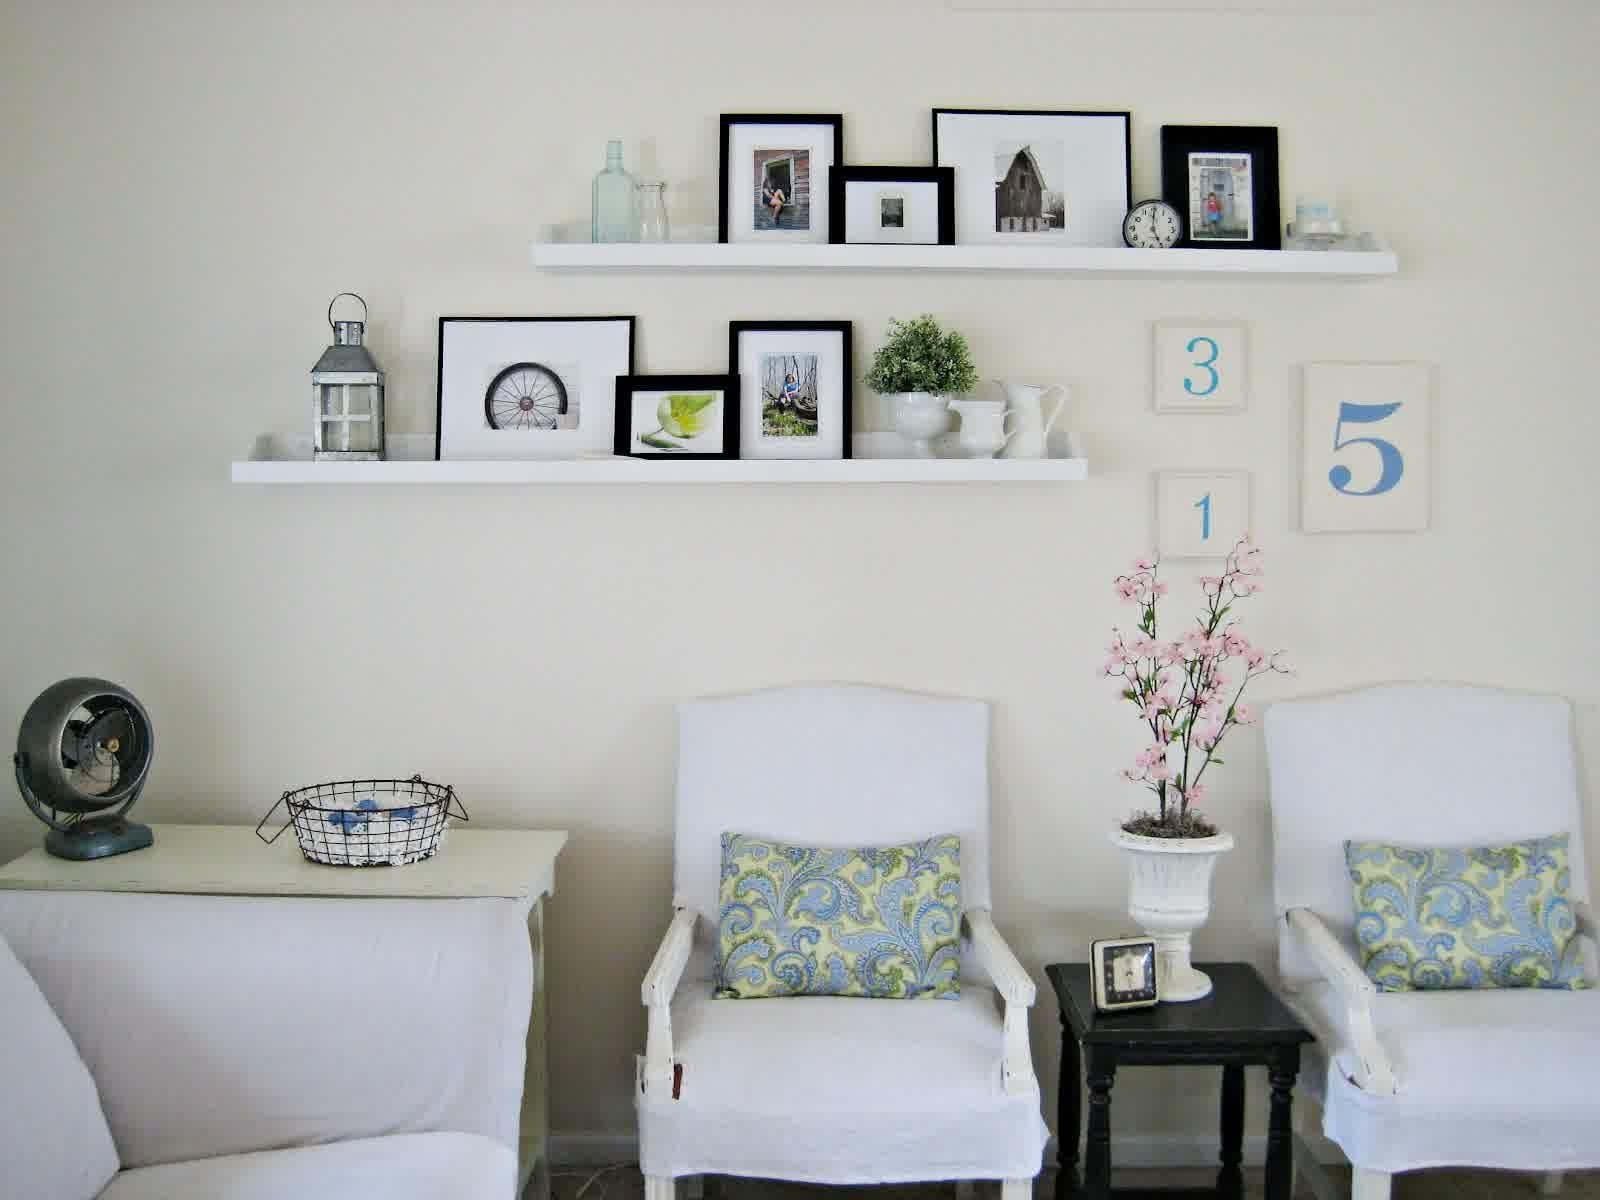 Wall Ledge Shelf Ideas | http://gagnant59.com | Pinterest | Wall ...